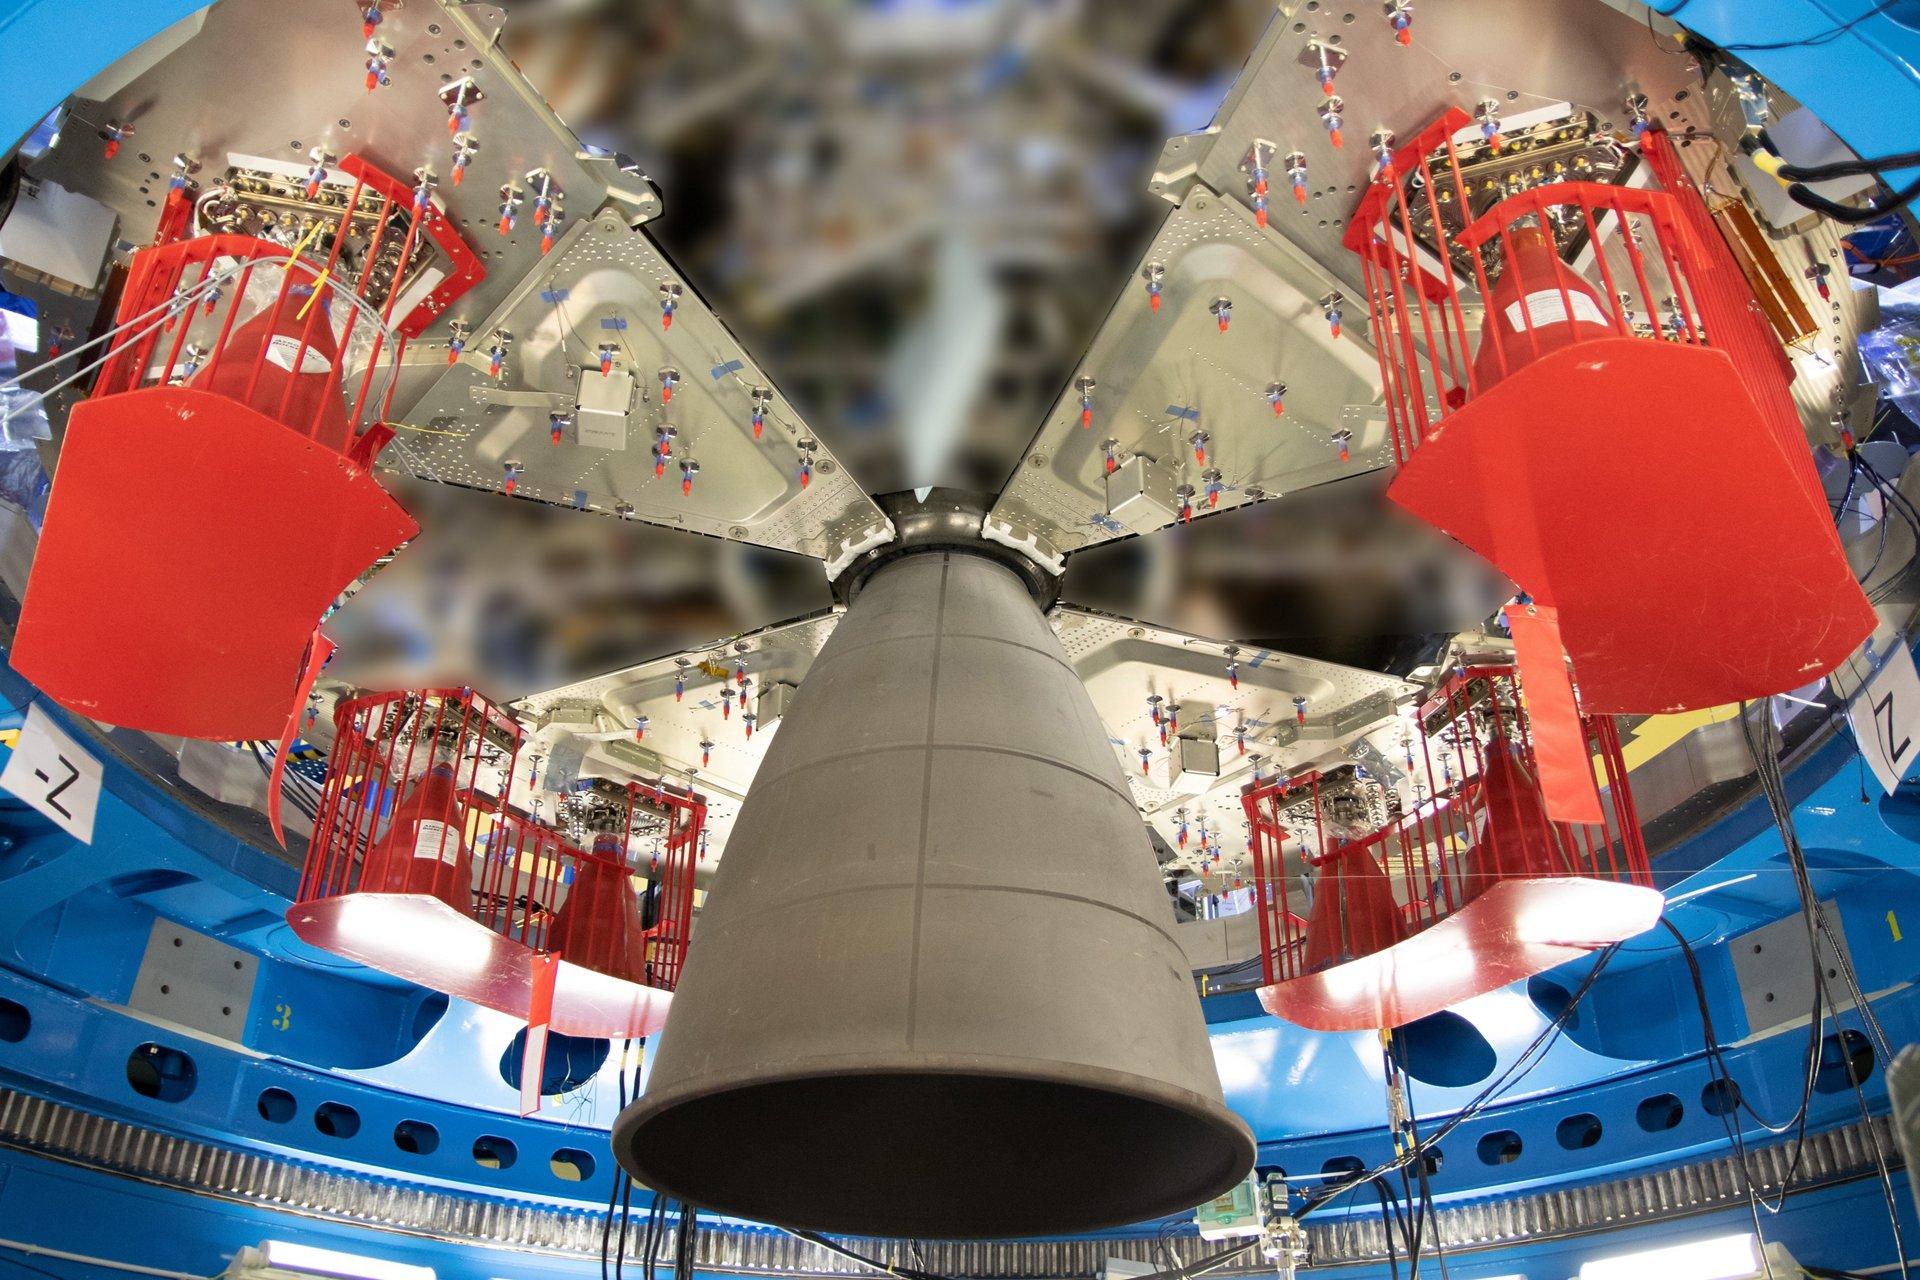 ESM是欧洲为美国国家航空航天局(NASA)开发的猎户座宇宙飞船做出的贡献。